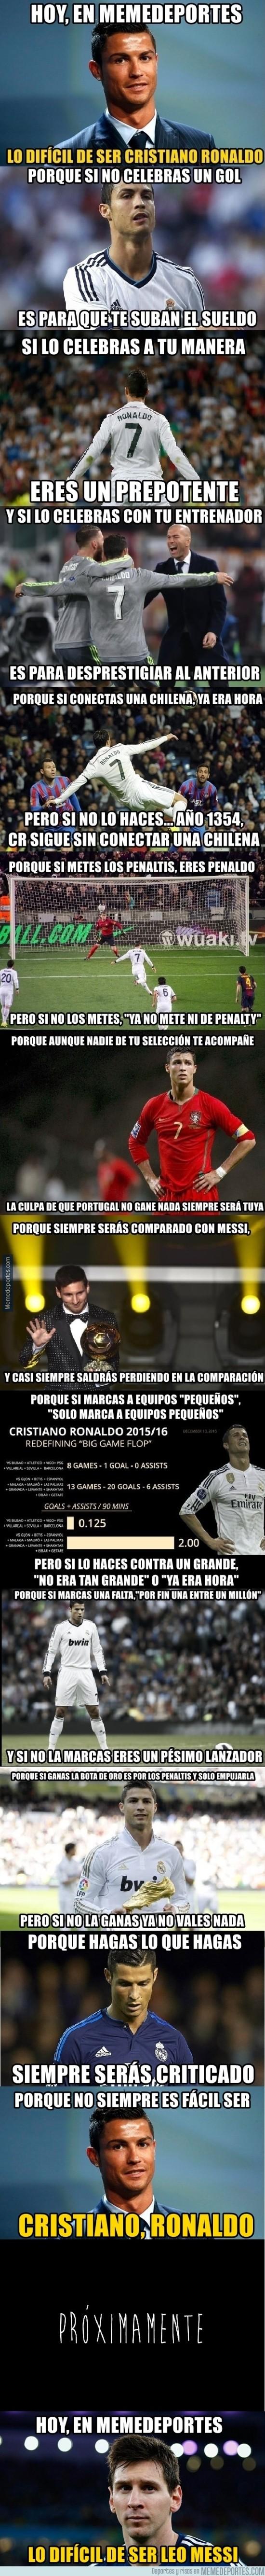 806366 - Lo díficil de ser Cristiano Ronaldo